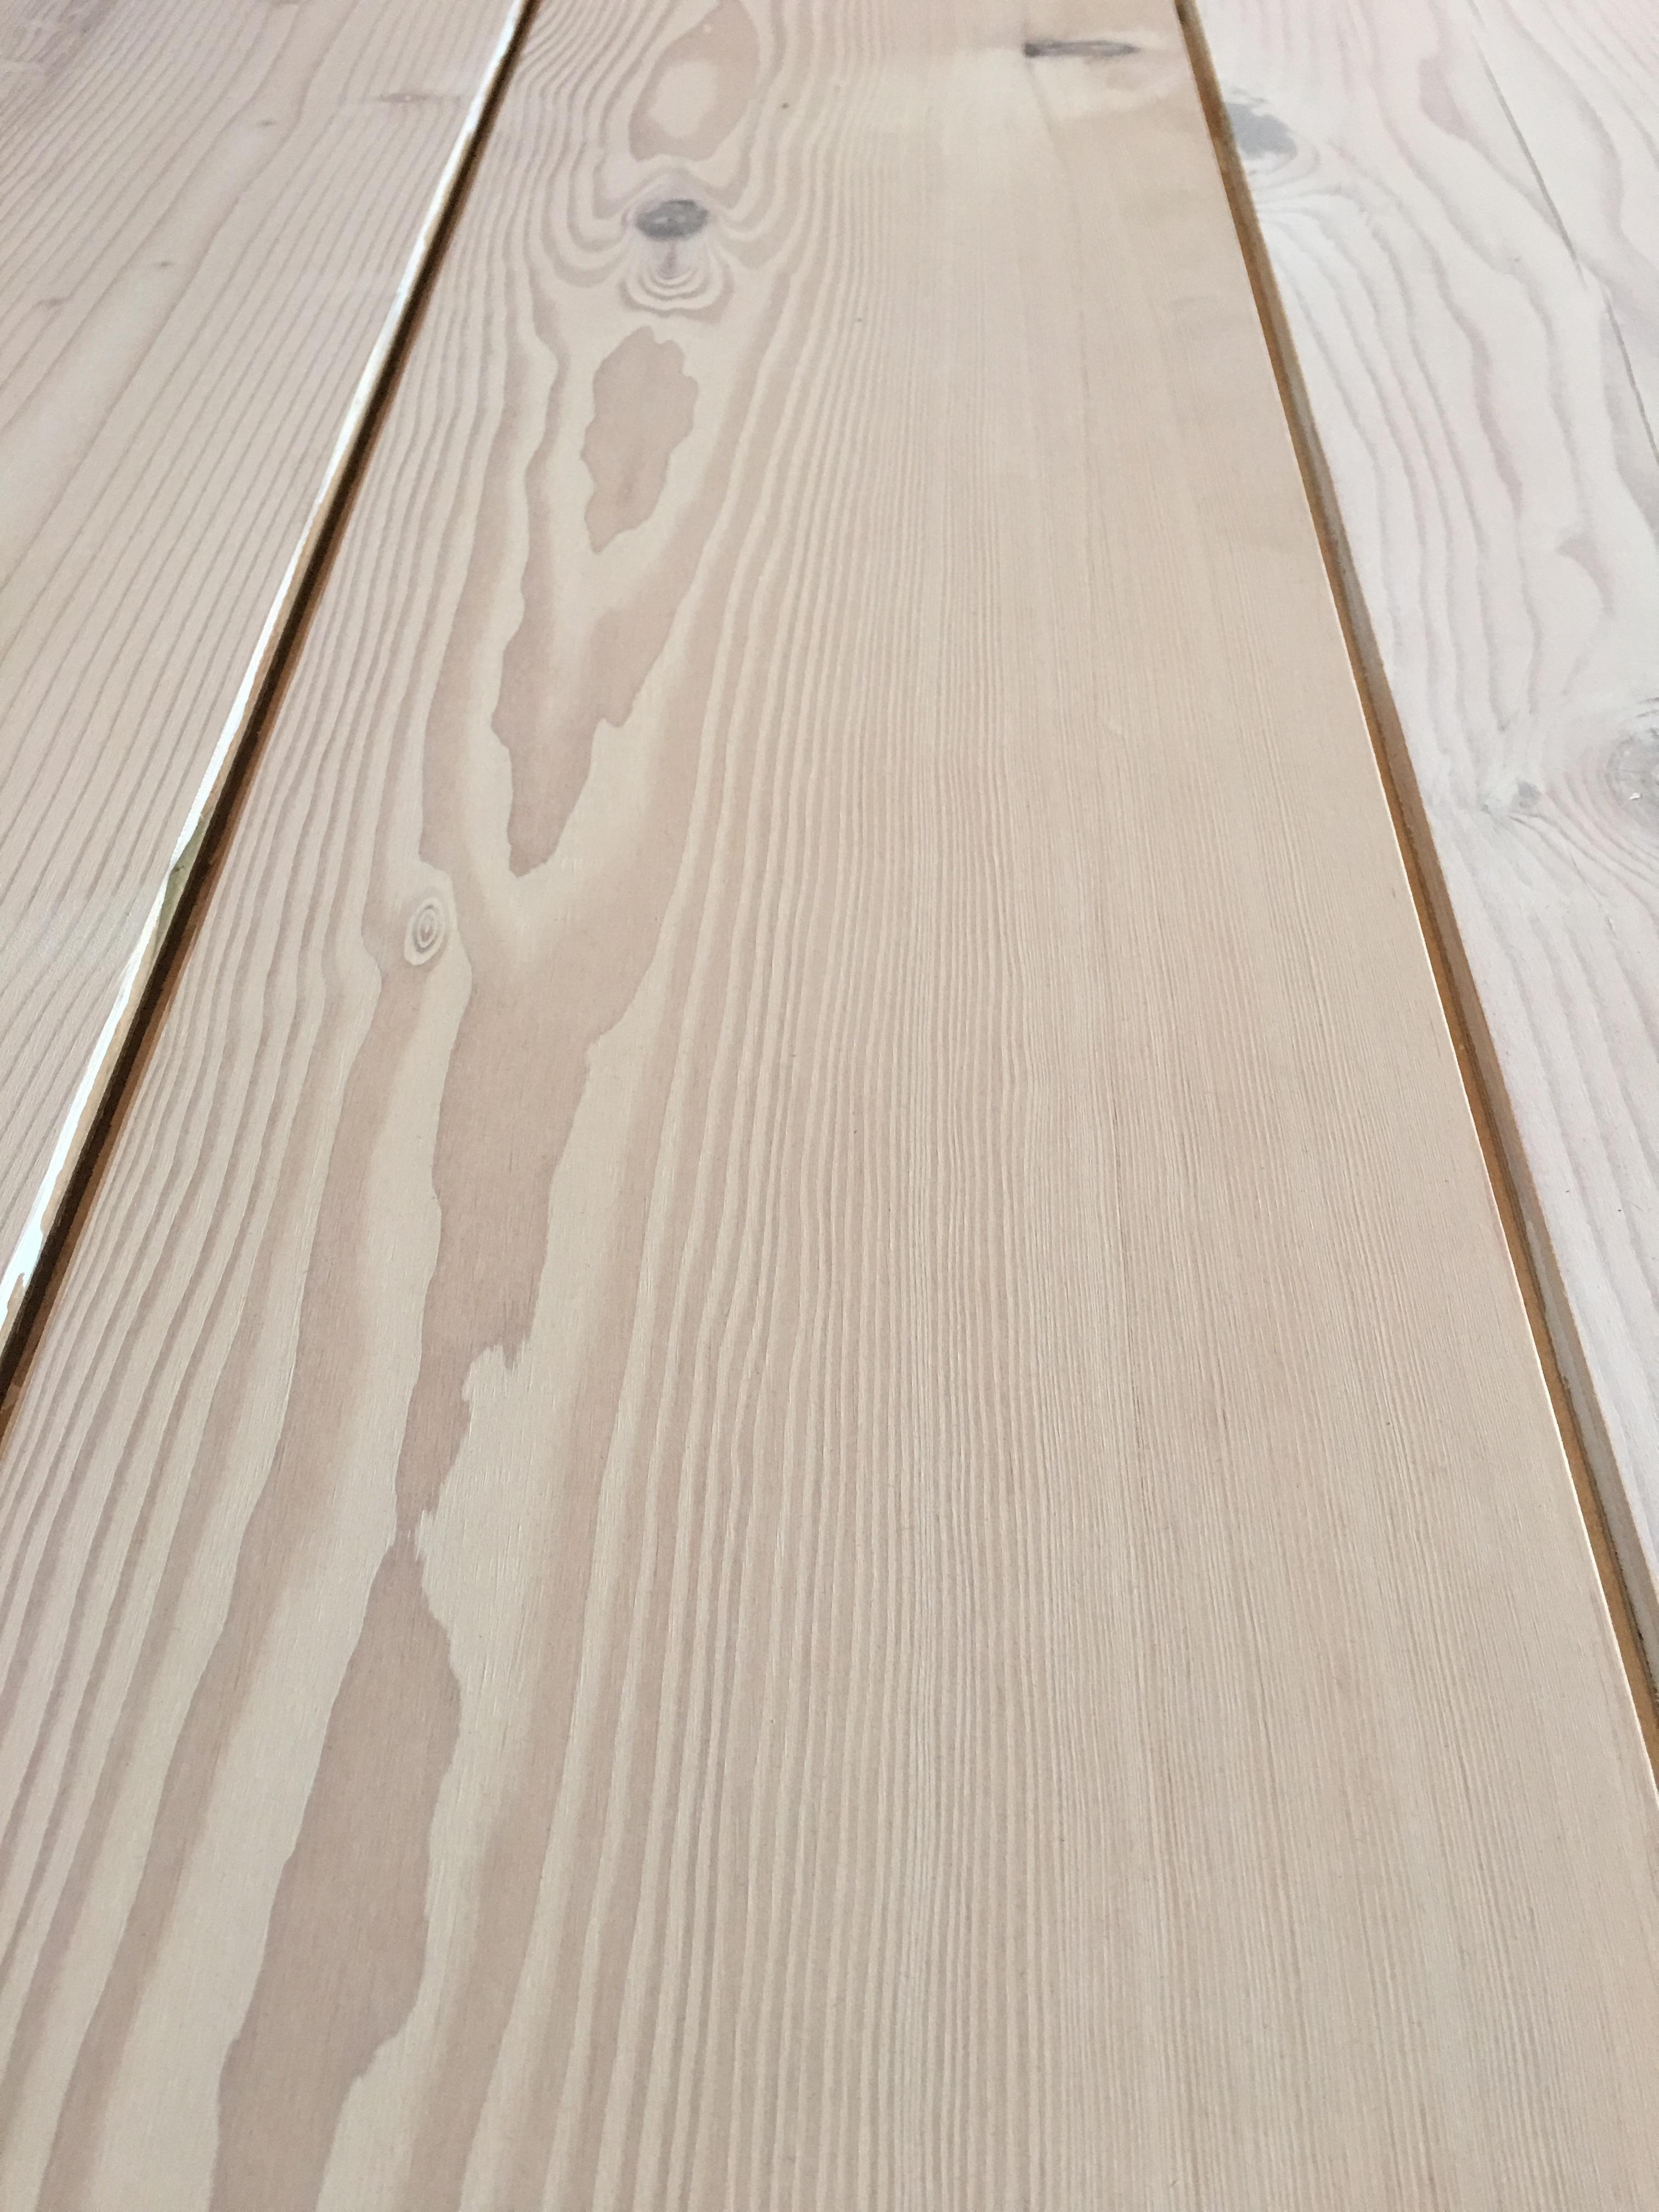 wood doug douglas flooring fir inspiring solid reclaimed floor ideas floors